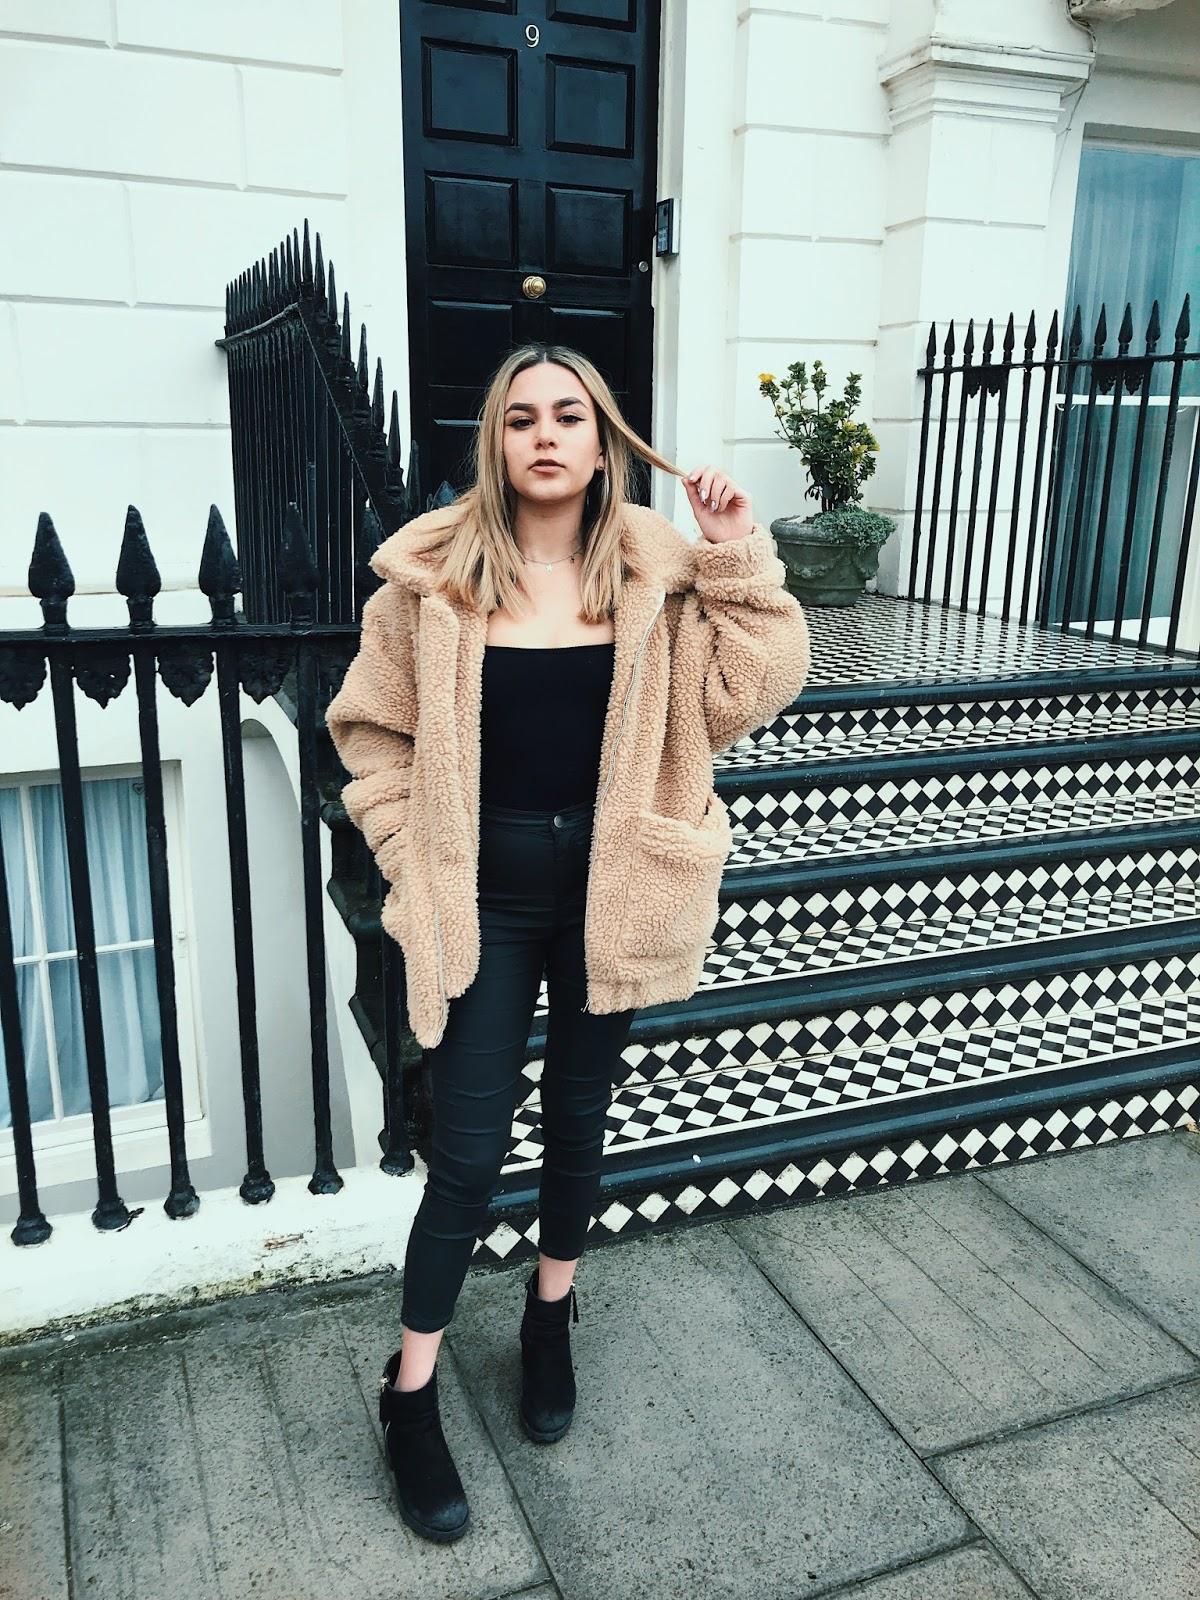 blogging mould lack of diversity minority bloggers - yasmin stefanie street style i am gia brandy melville